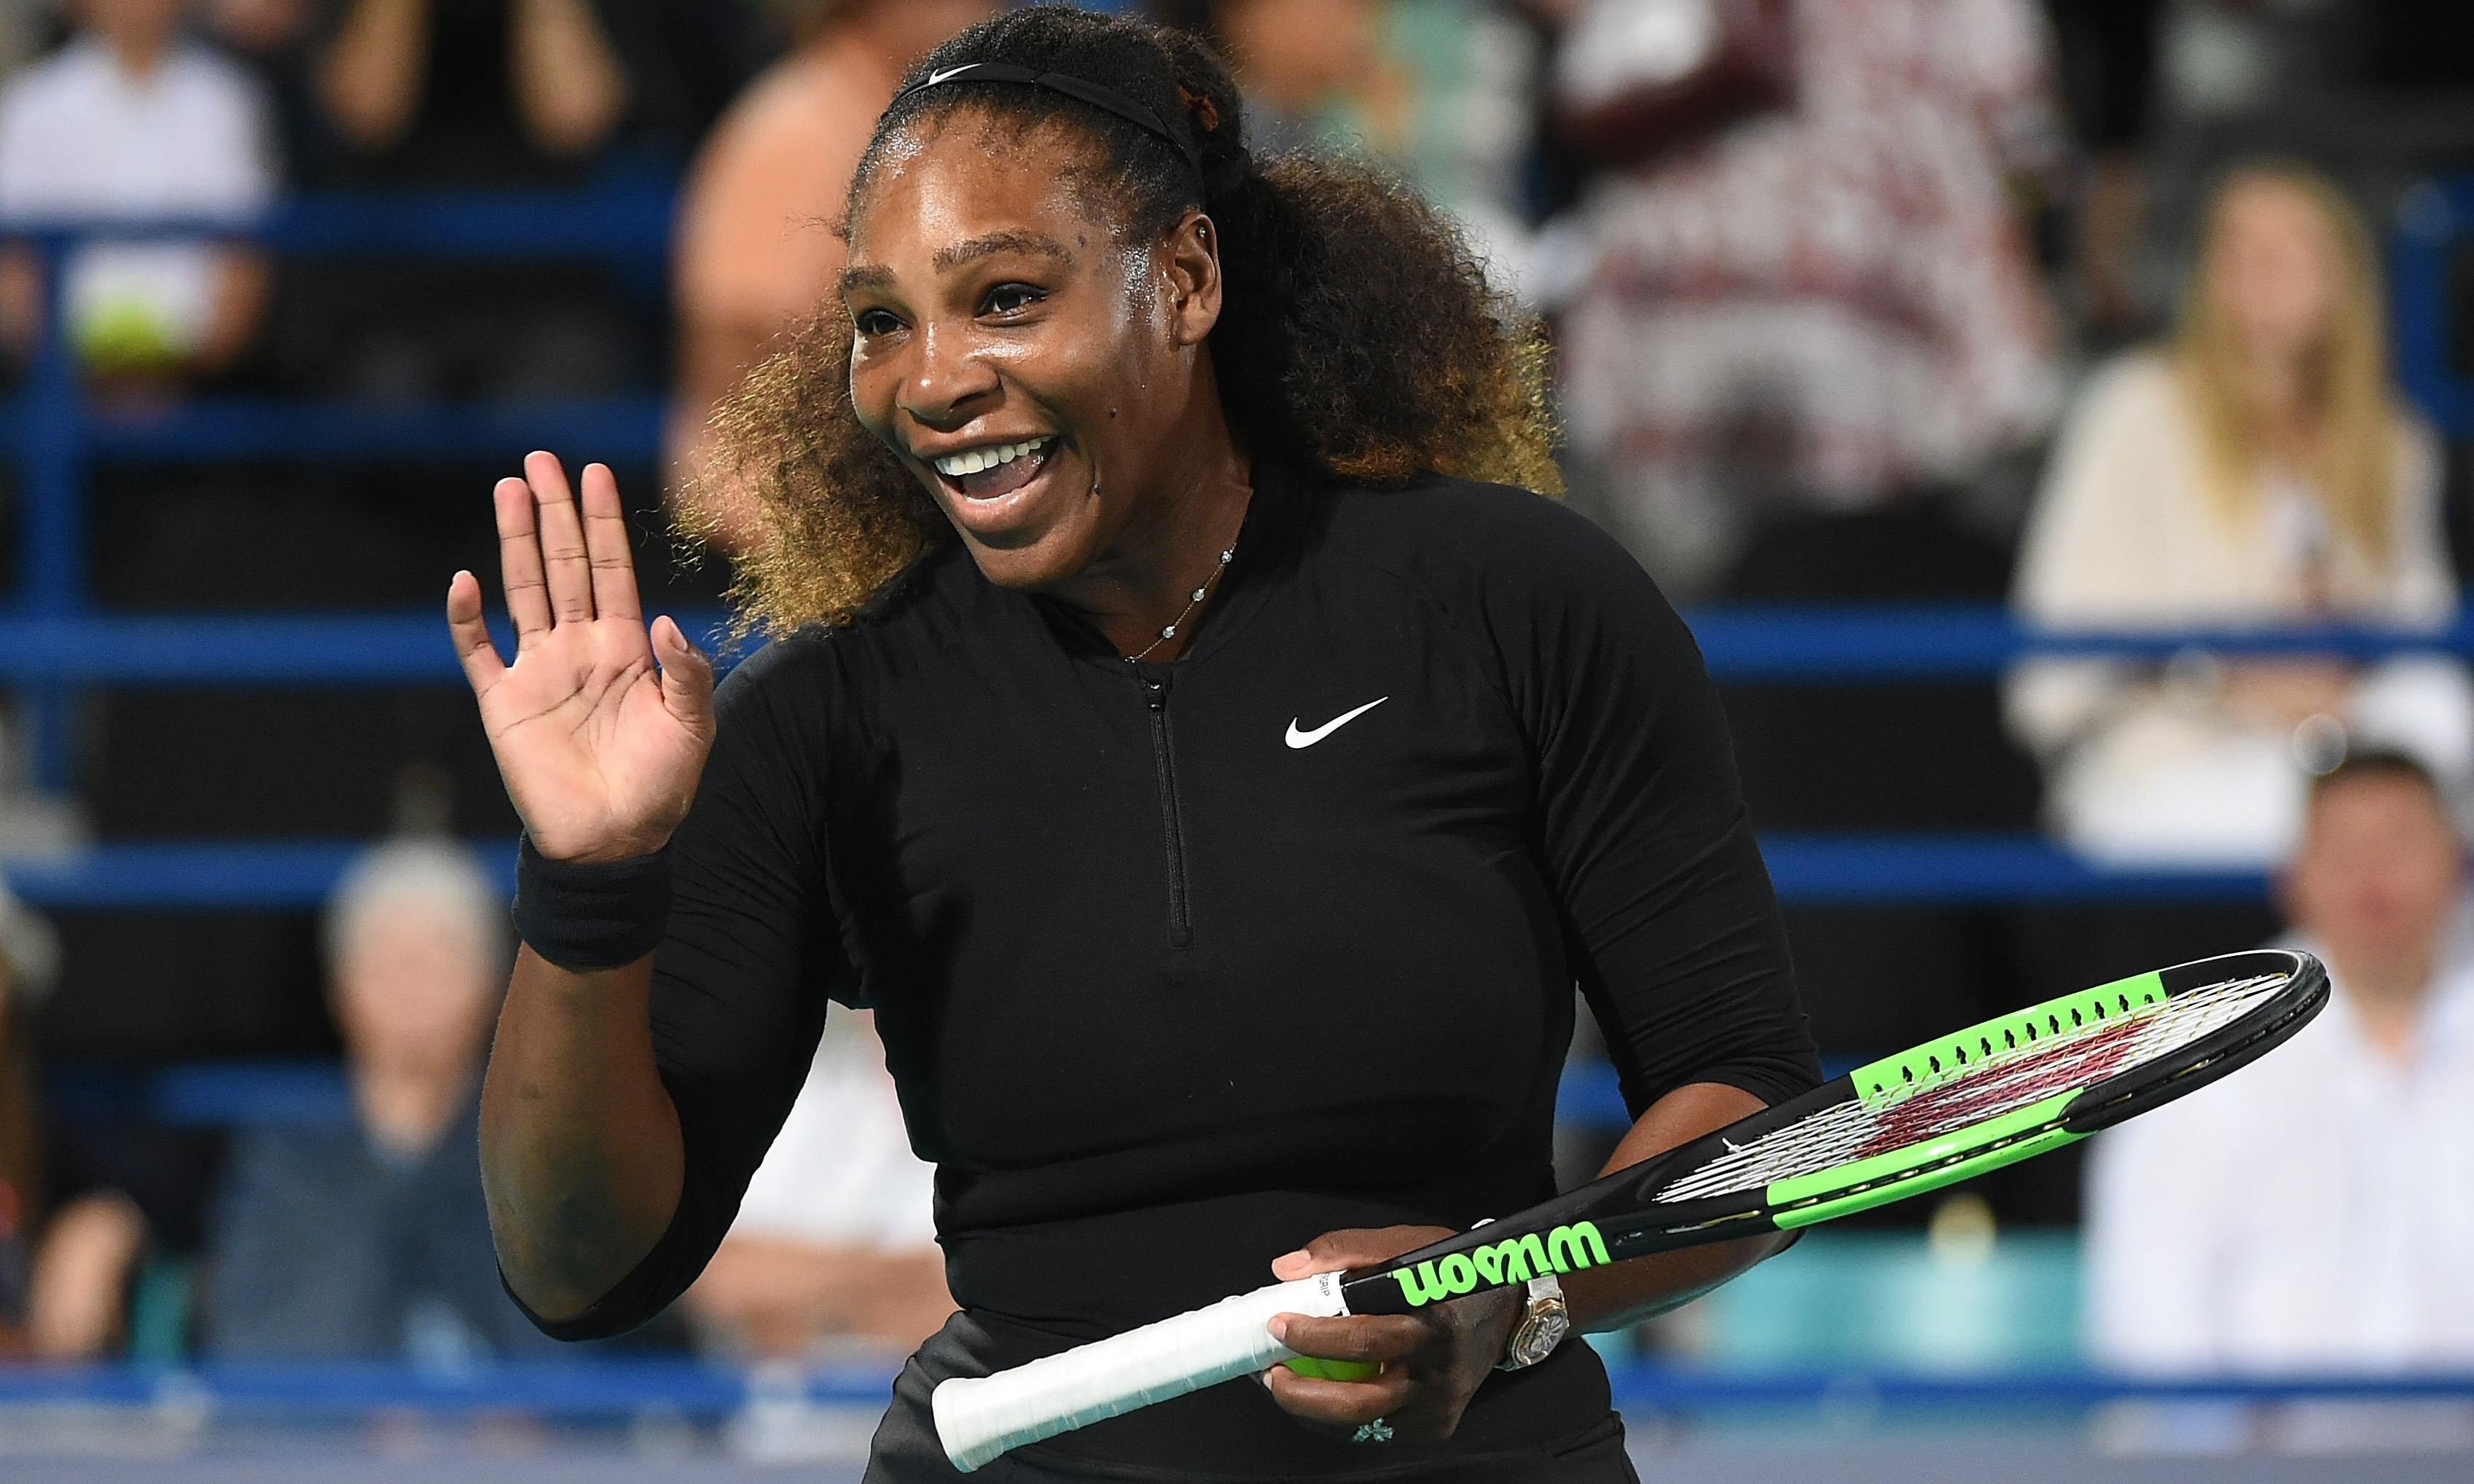 Defending champion Serena Williams withdraws from Australian Open